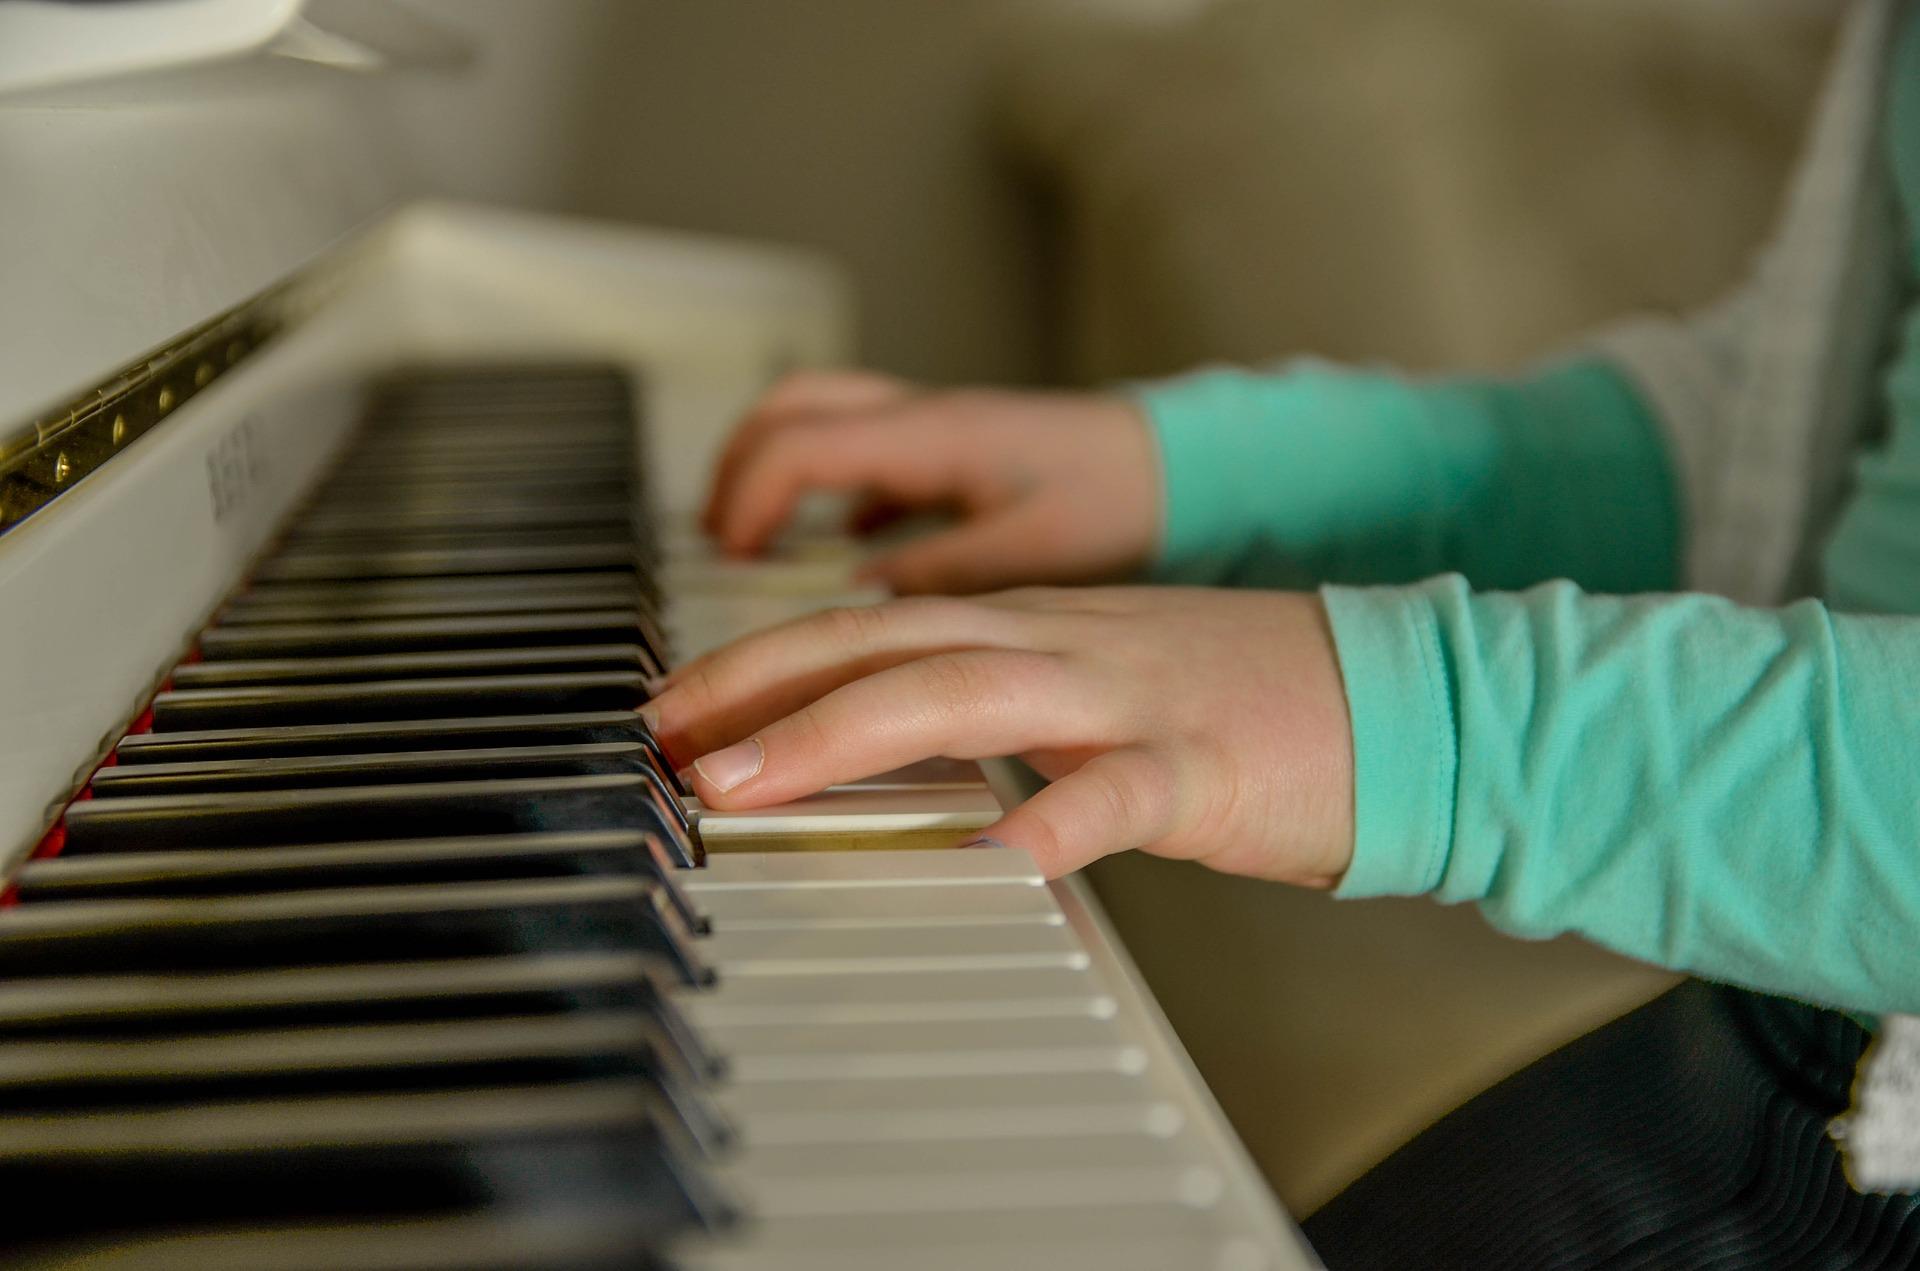 Website piano-3290798_1920.jpg